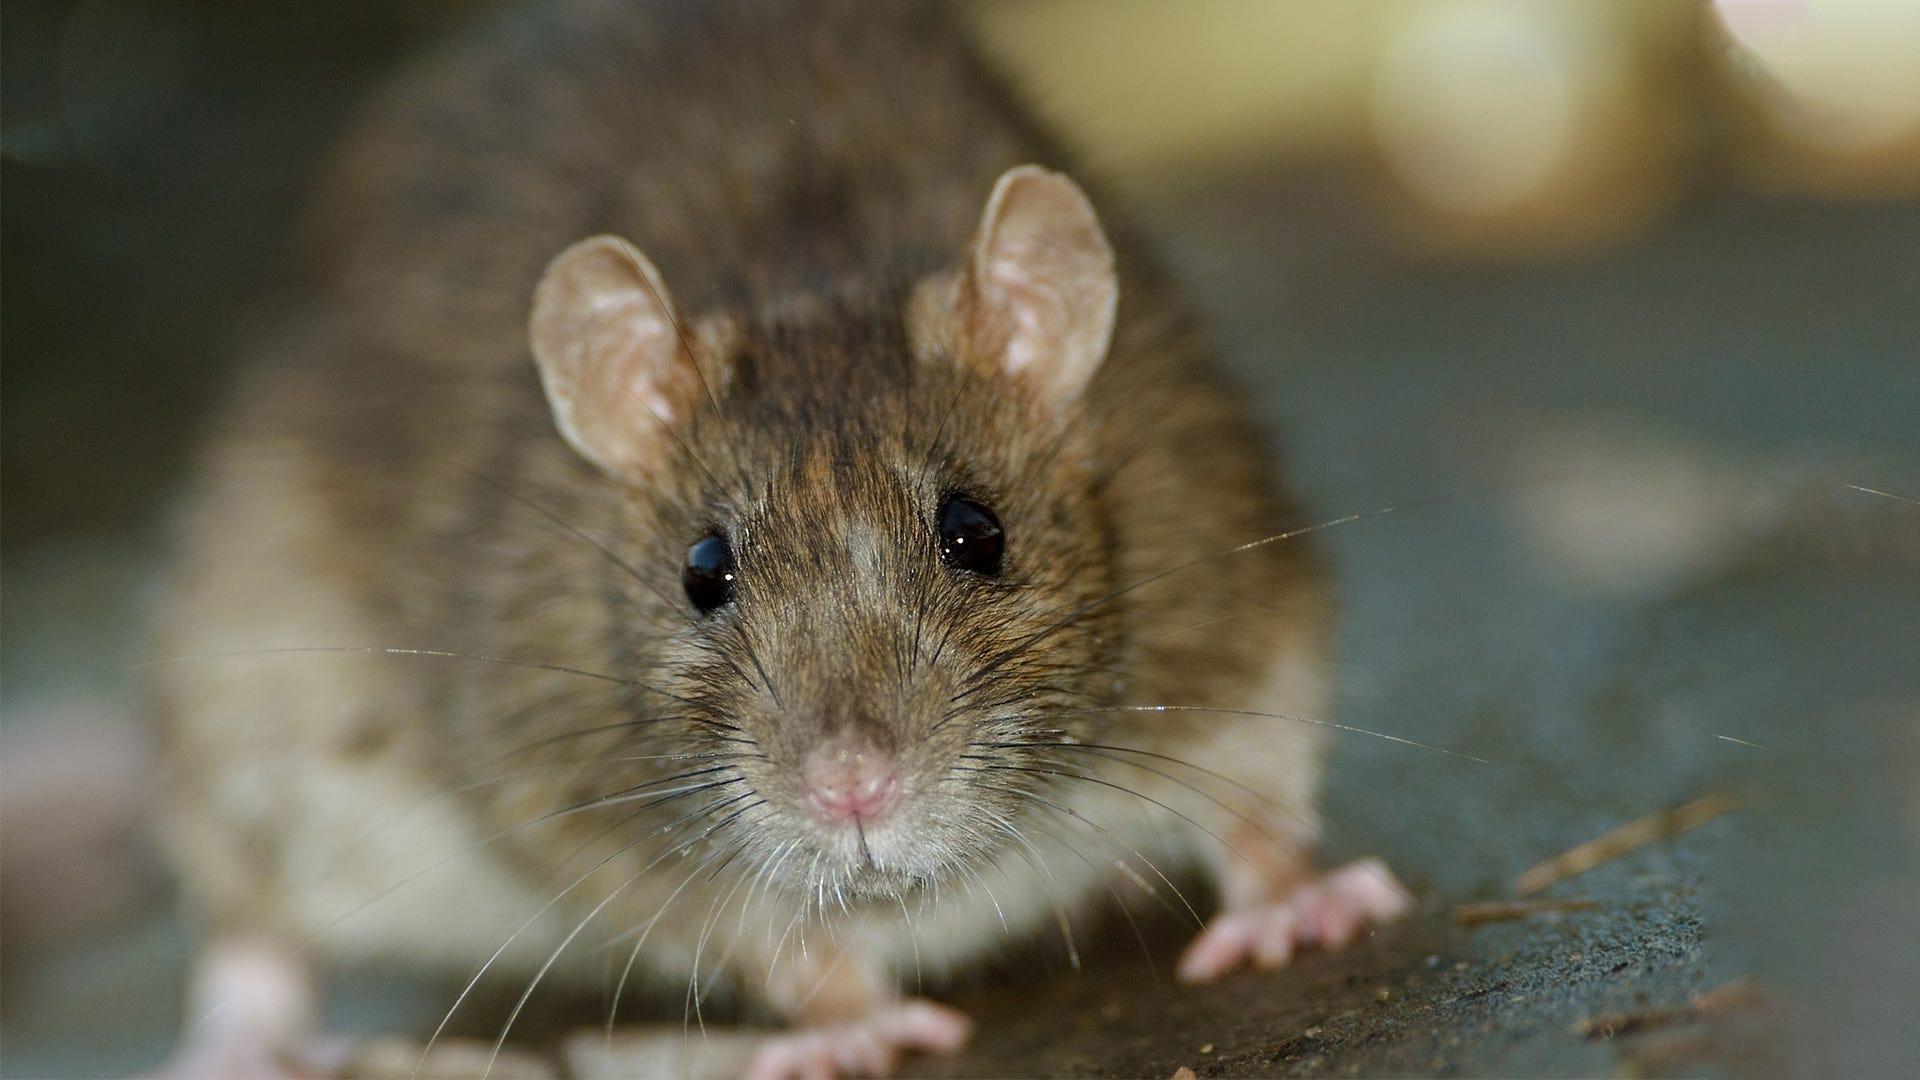 My 17 Years of Rescuing Rodents - Havahart's Wild Neighborhood